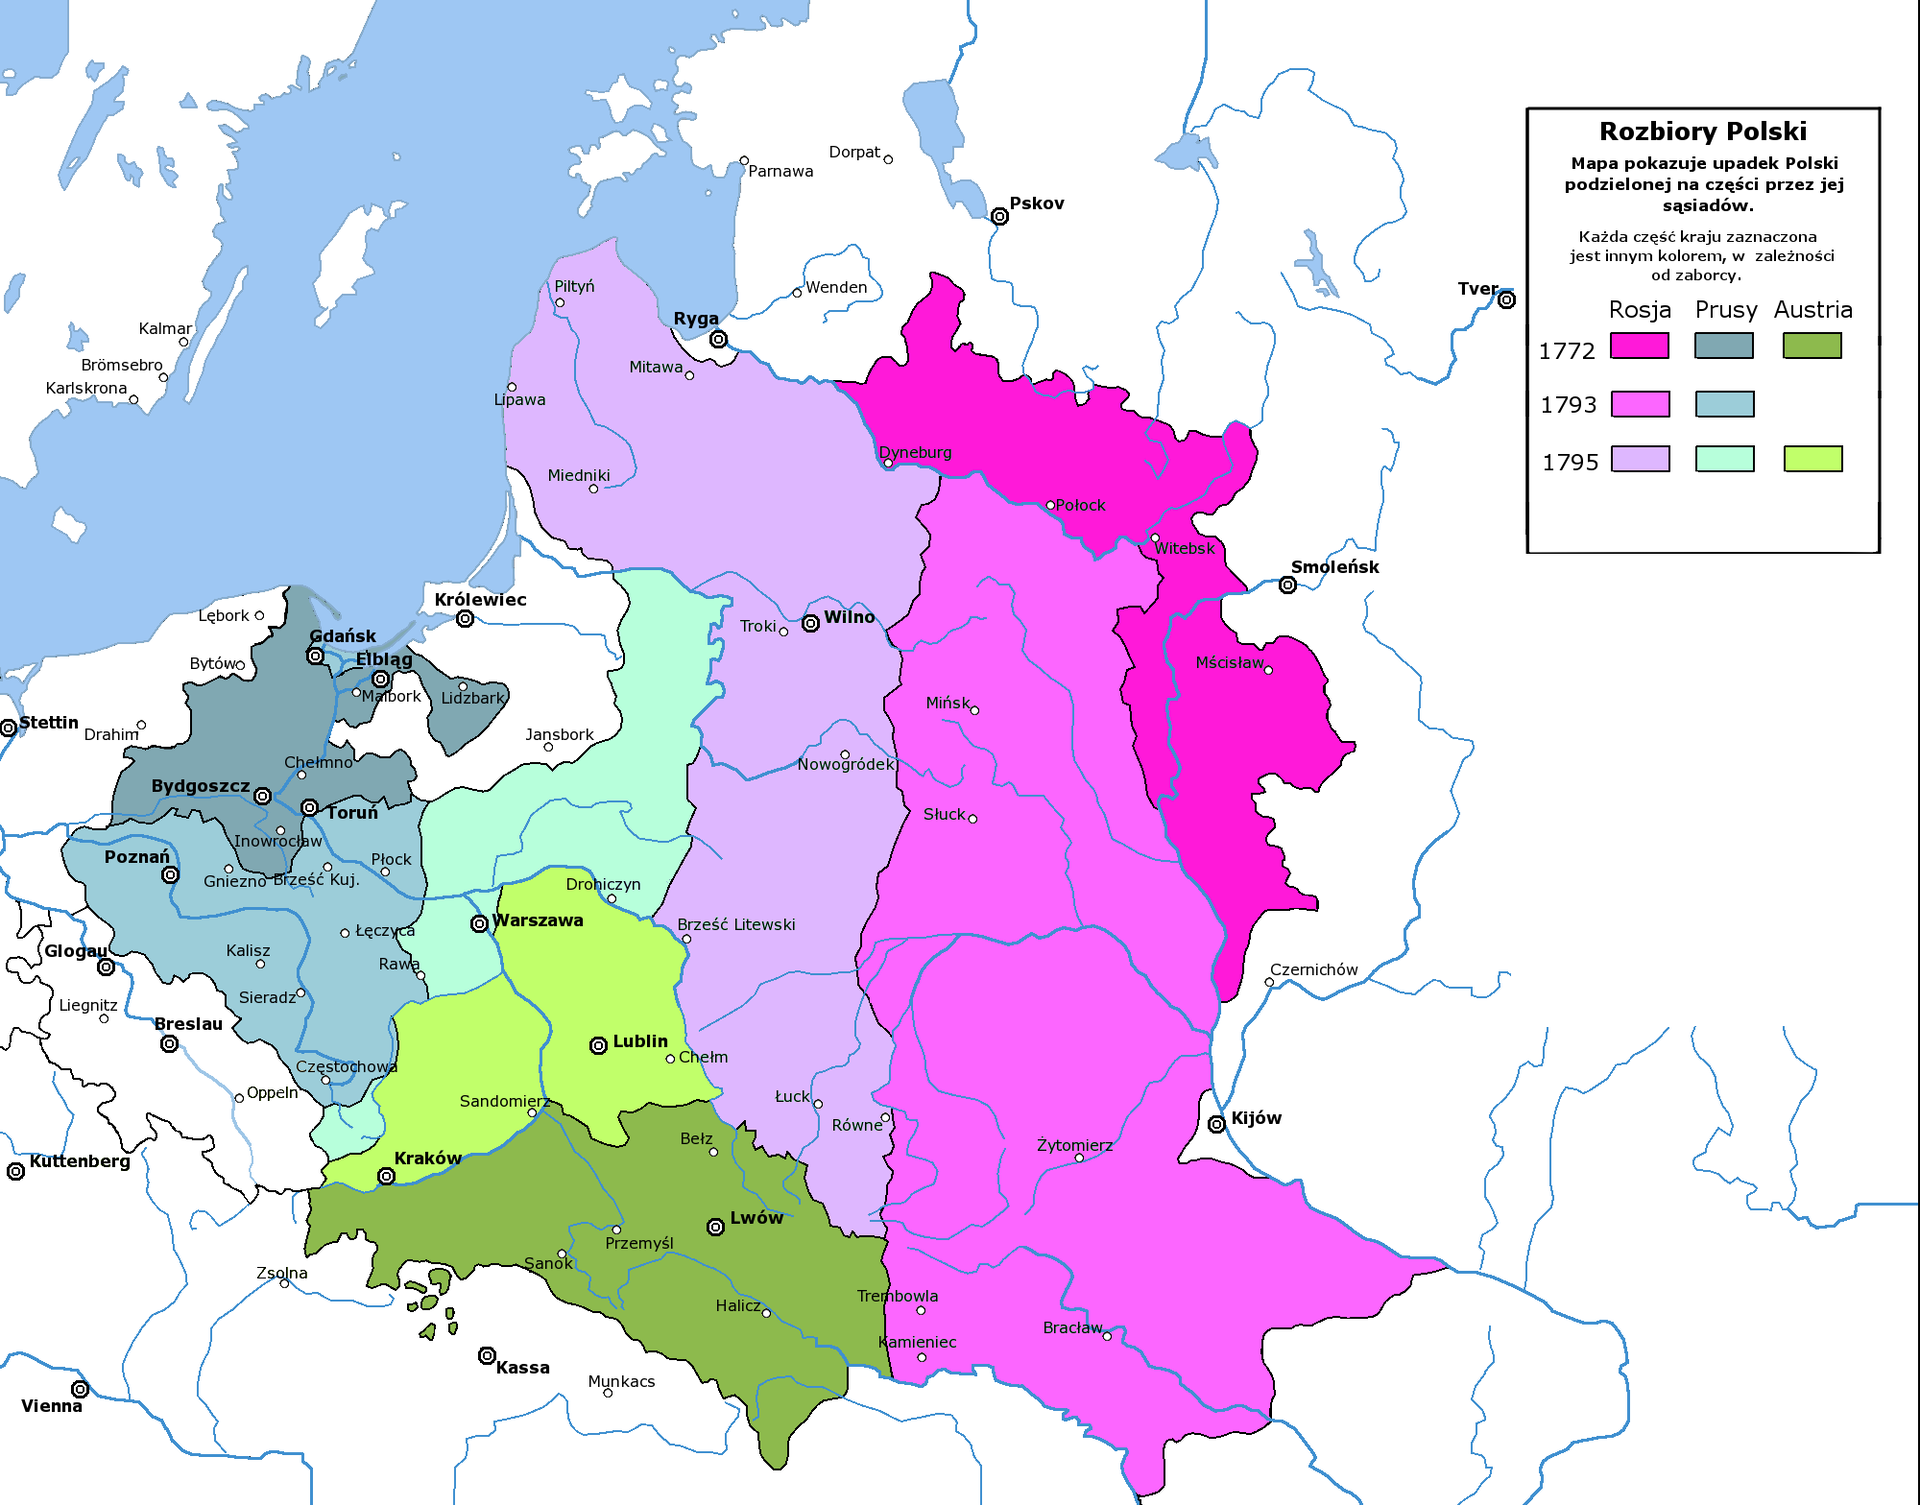 Rozbiory Polski Źródło: Halibutt, Rozbiory Polski, licencja: CC BY-SA 3.0.